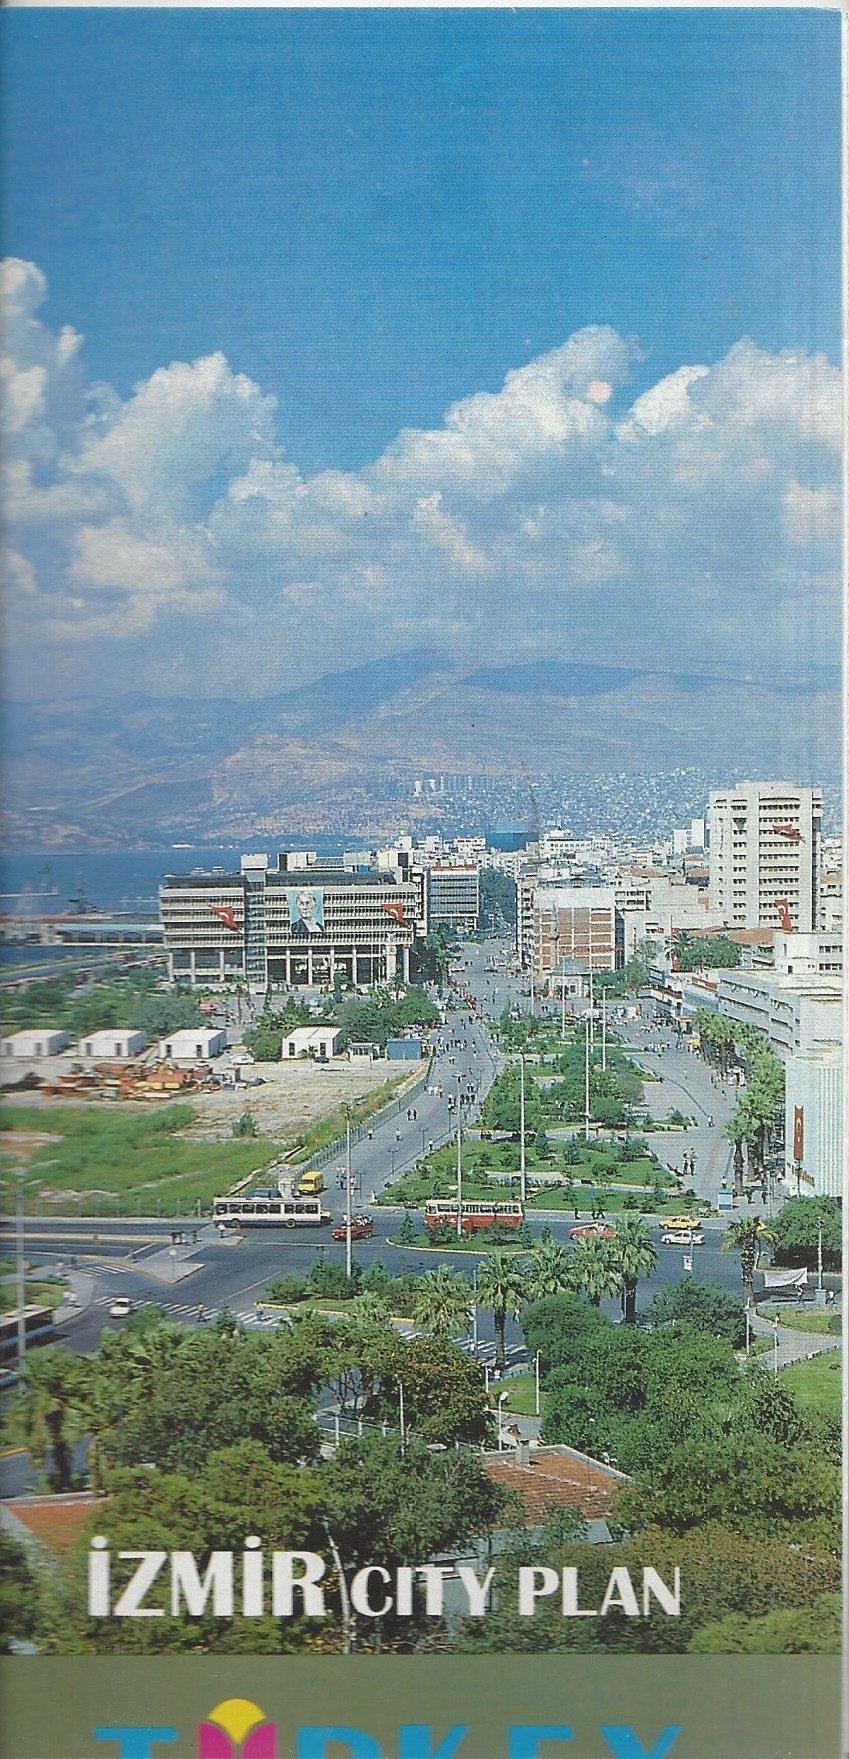 Izmir City Plan Turkey Map Ministry Of Tourism Amazon Com Books